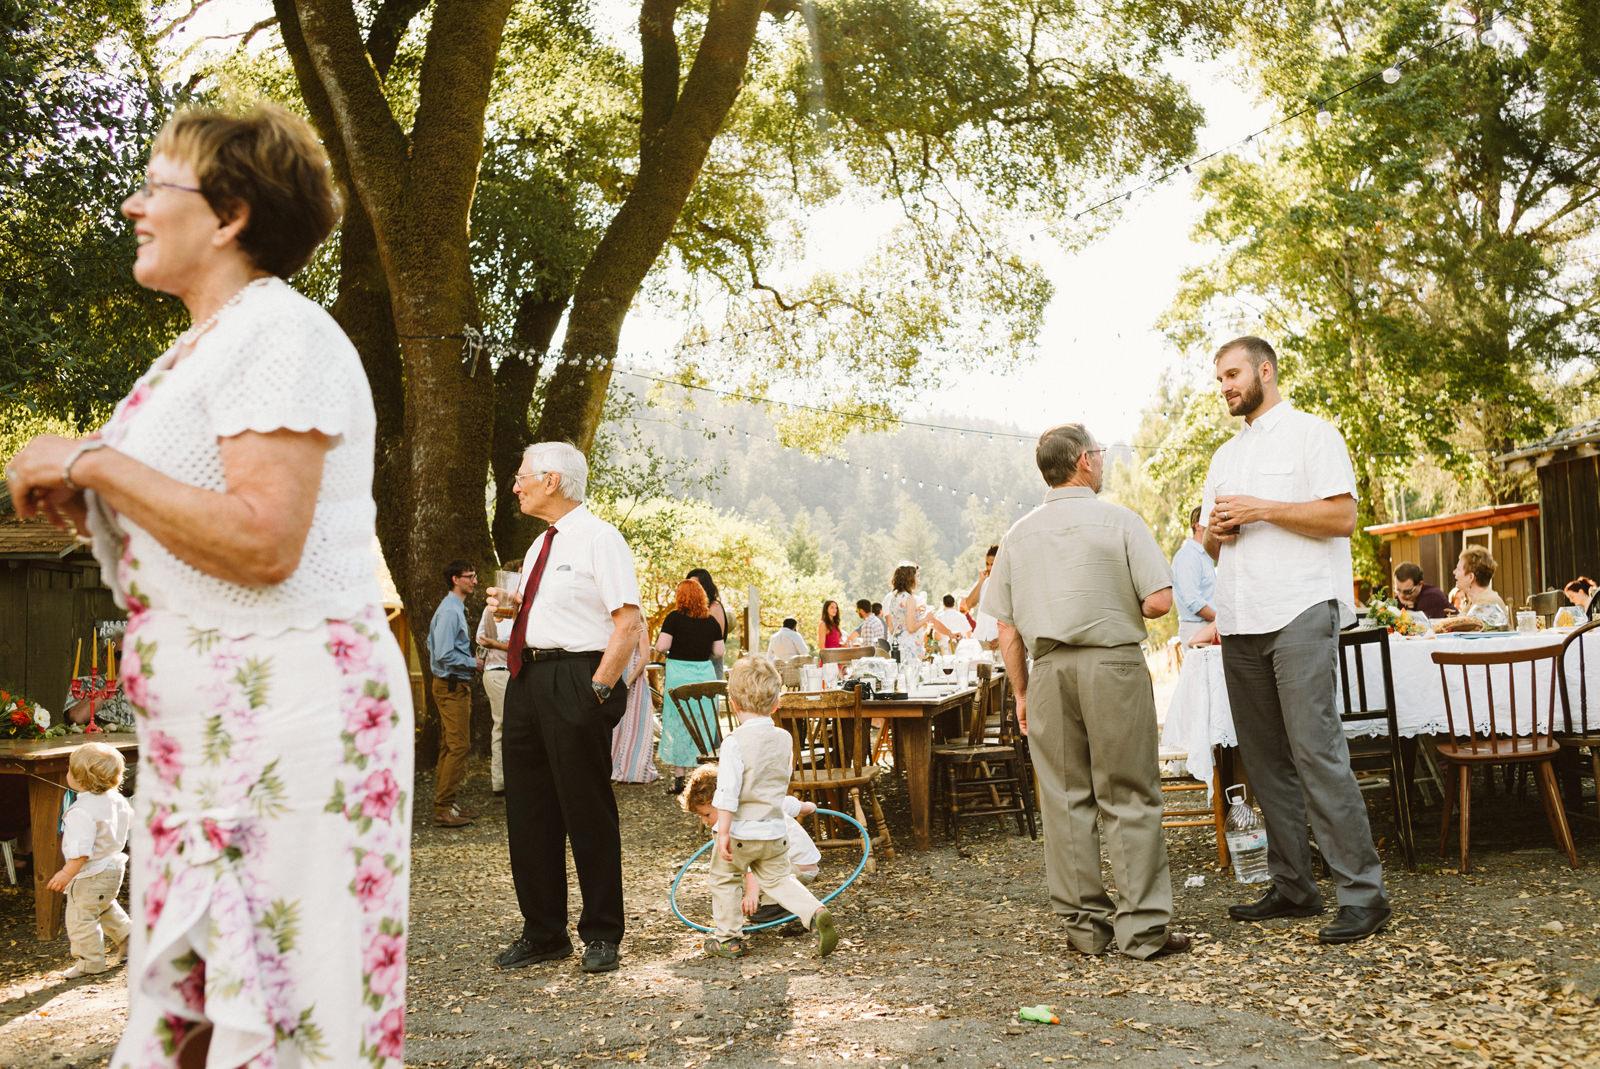 rivers-bend-retreat-wedding-067 RIVER'S BEND RETREAT WEDDING